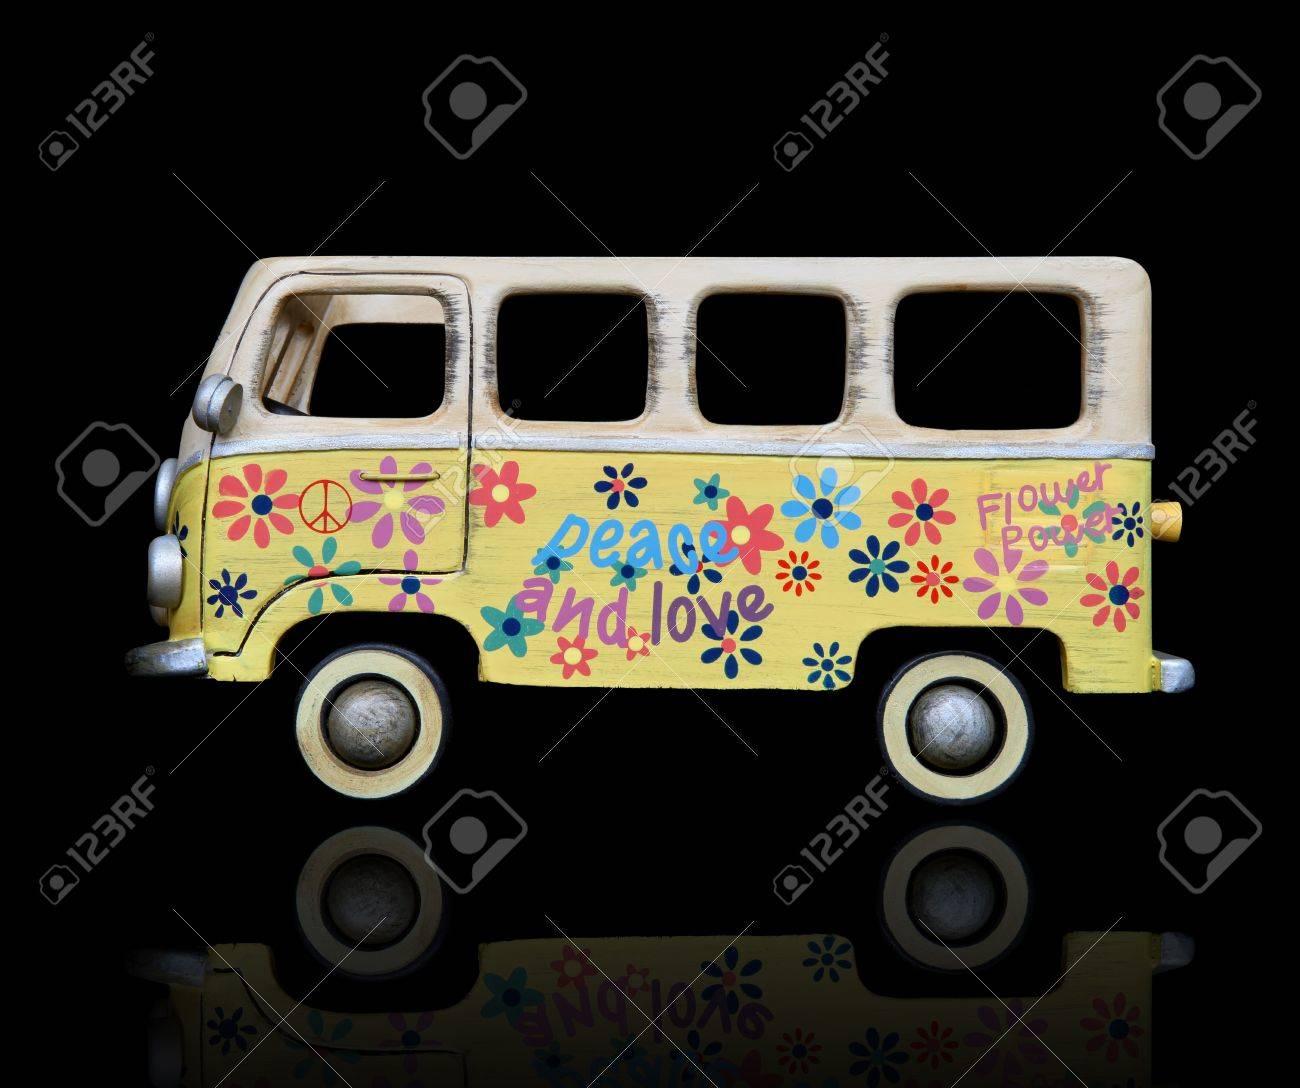 peace and love van ove...